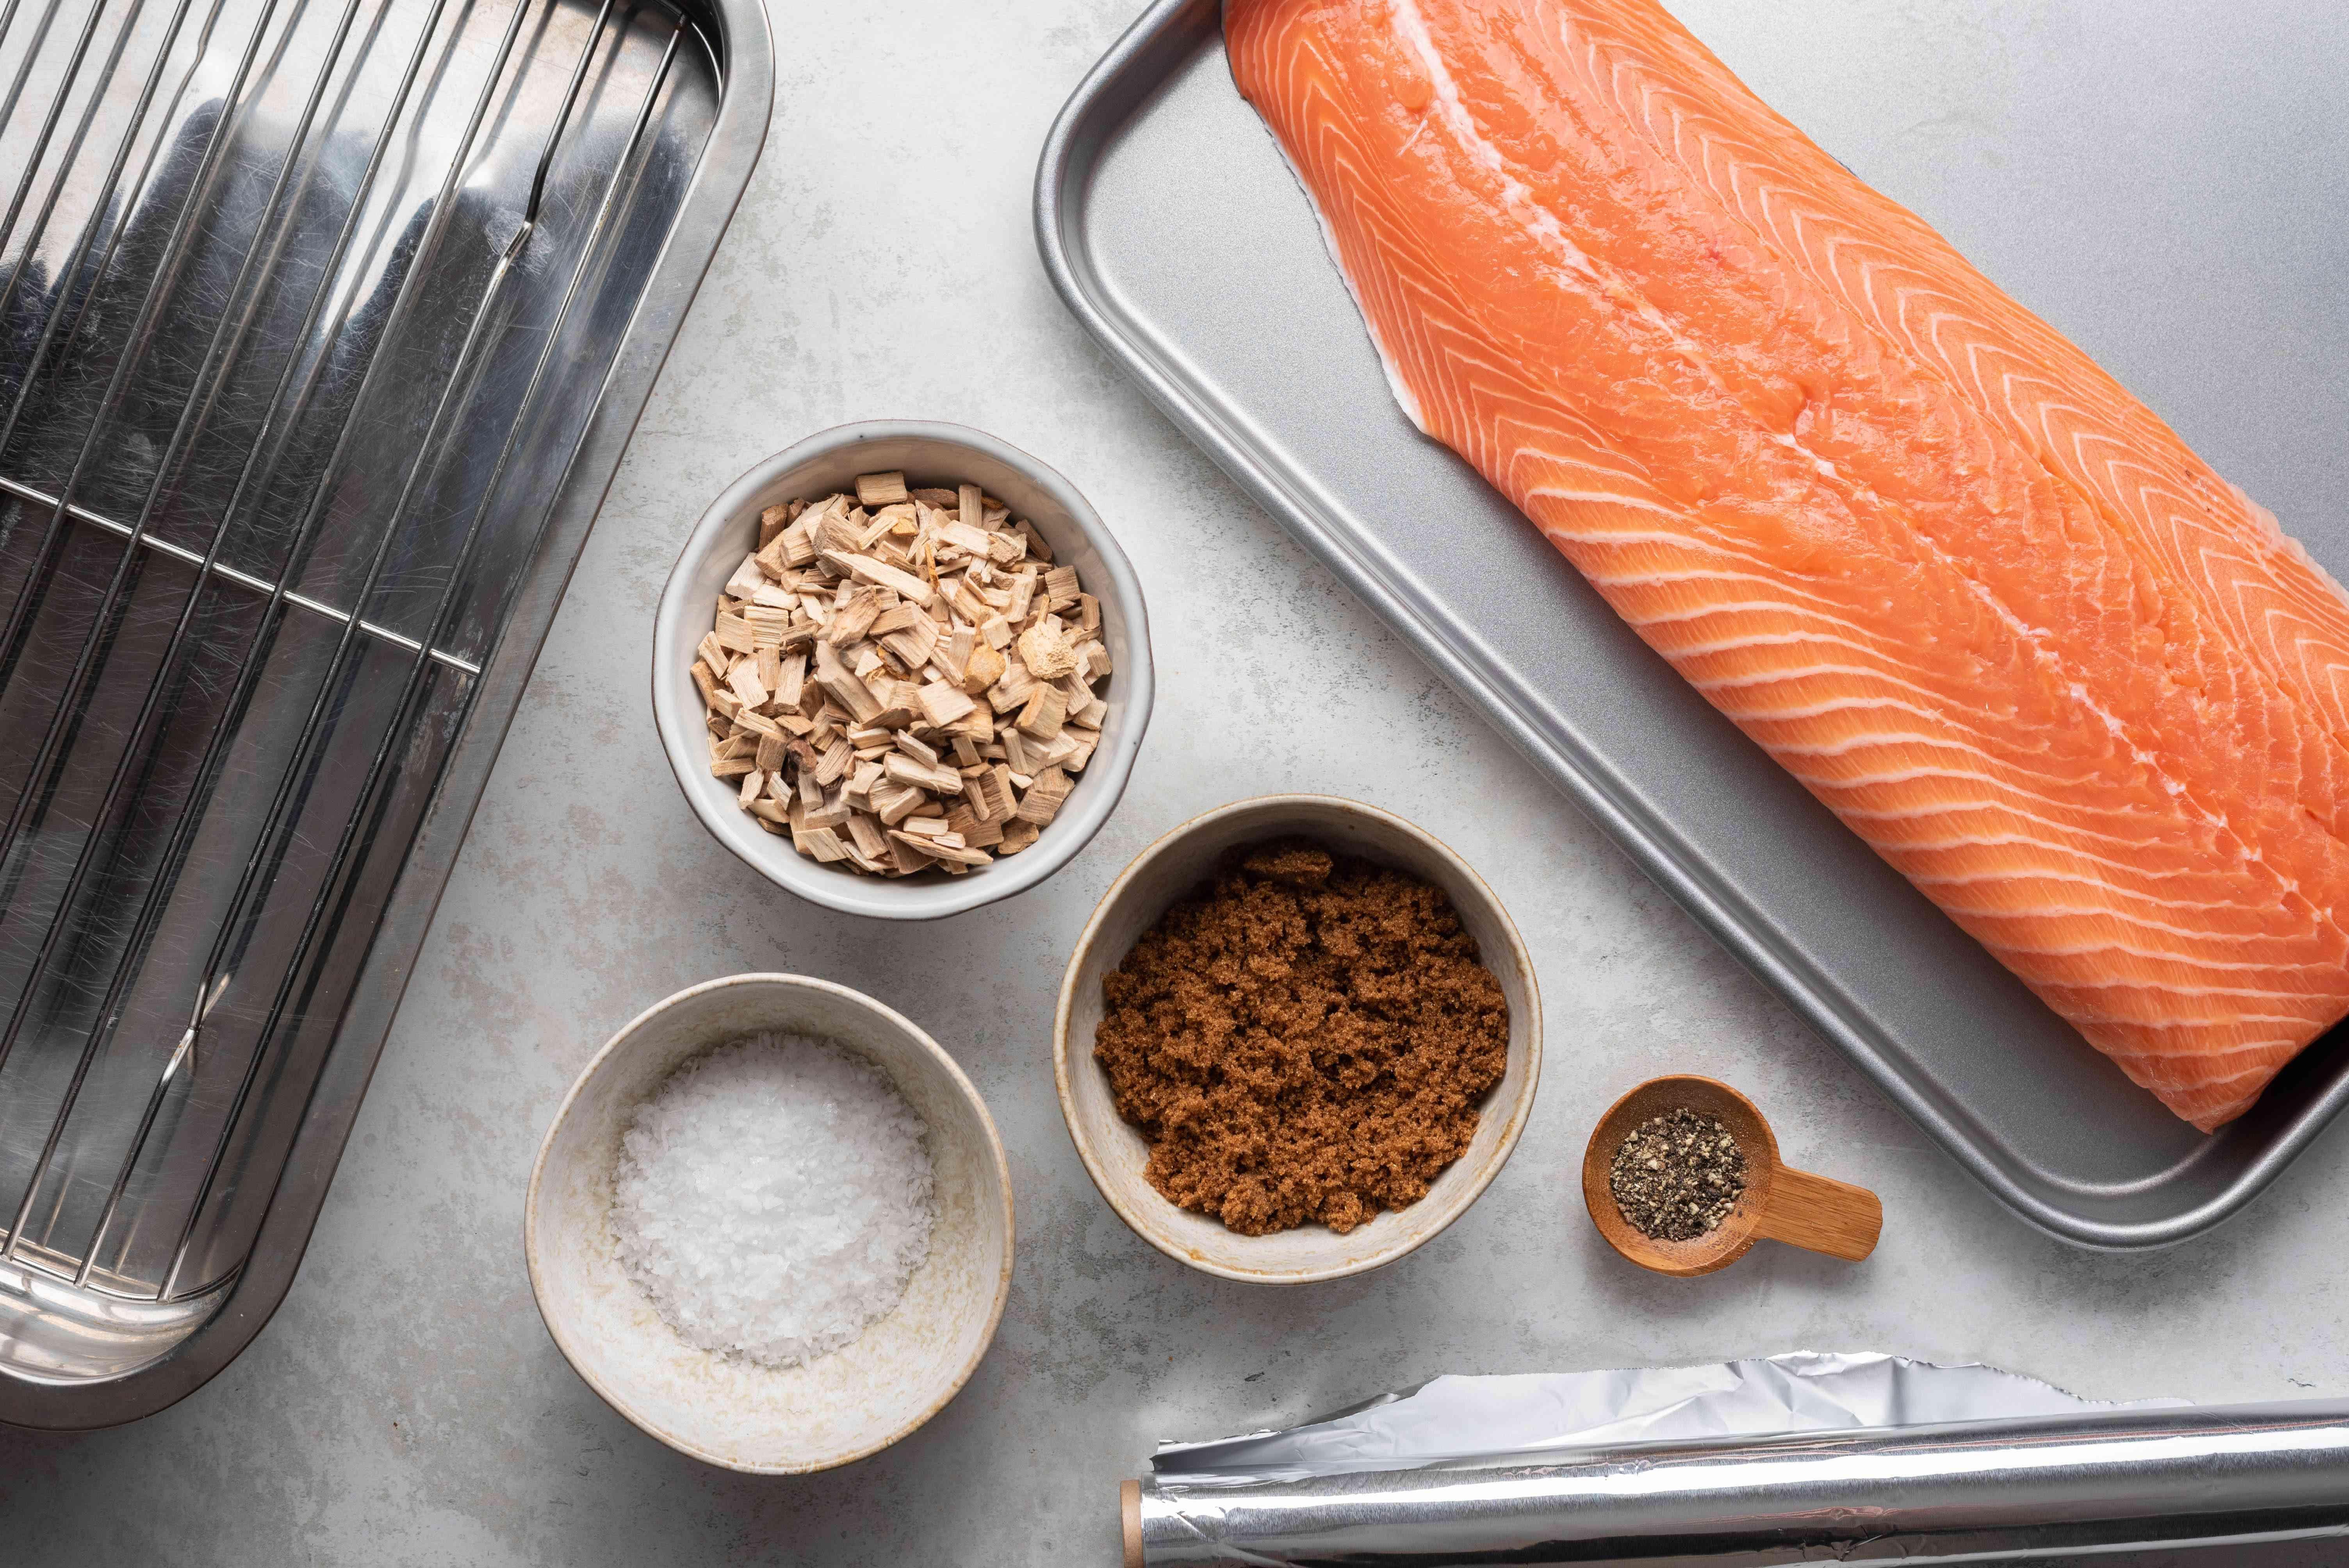 Stove Top Smoked Salmon ingredients